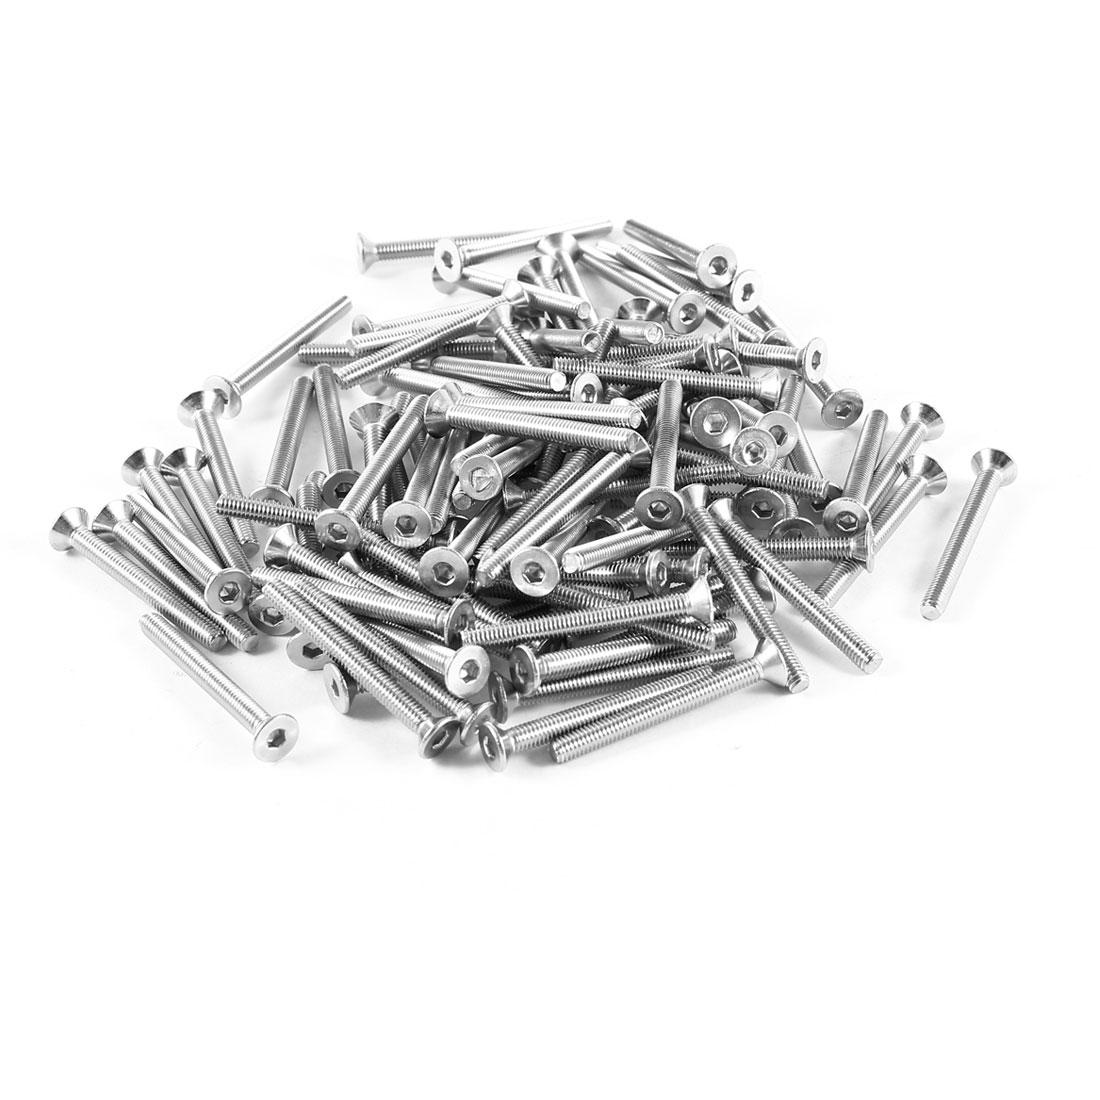 100 x 304HC Stainless Steel Countersunk Flat Head Hex Socket Bolts Screw M3x28mm